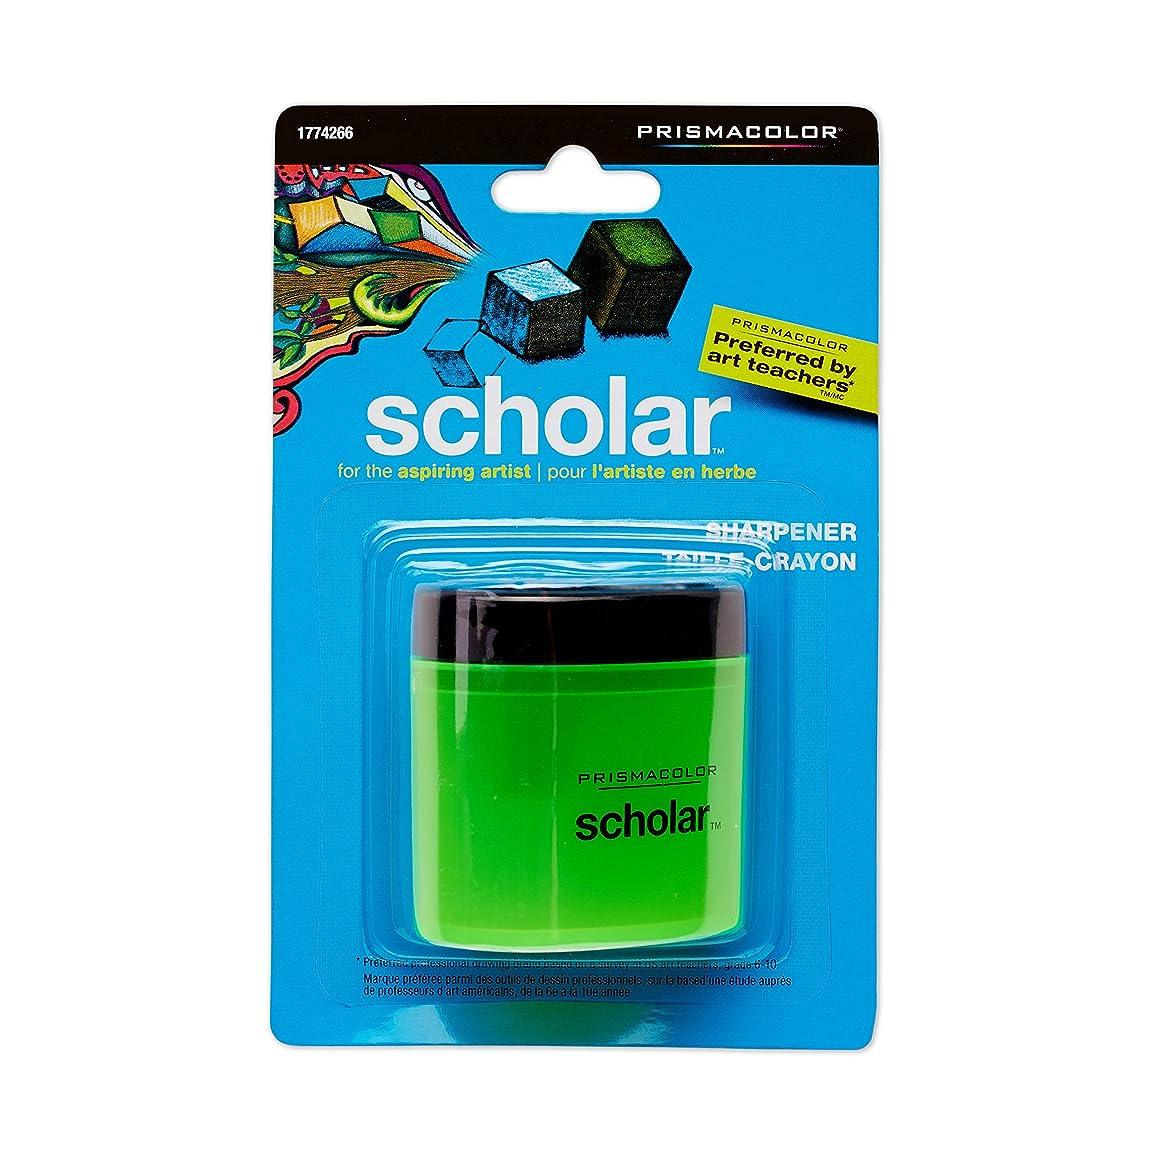 Prismacolor Scholar Pencil Sharpener wcghqf599